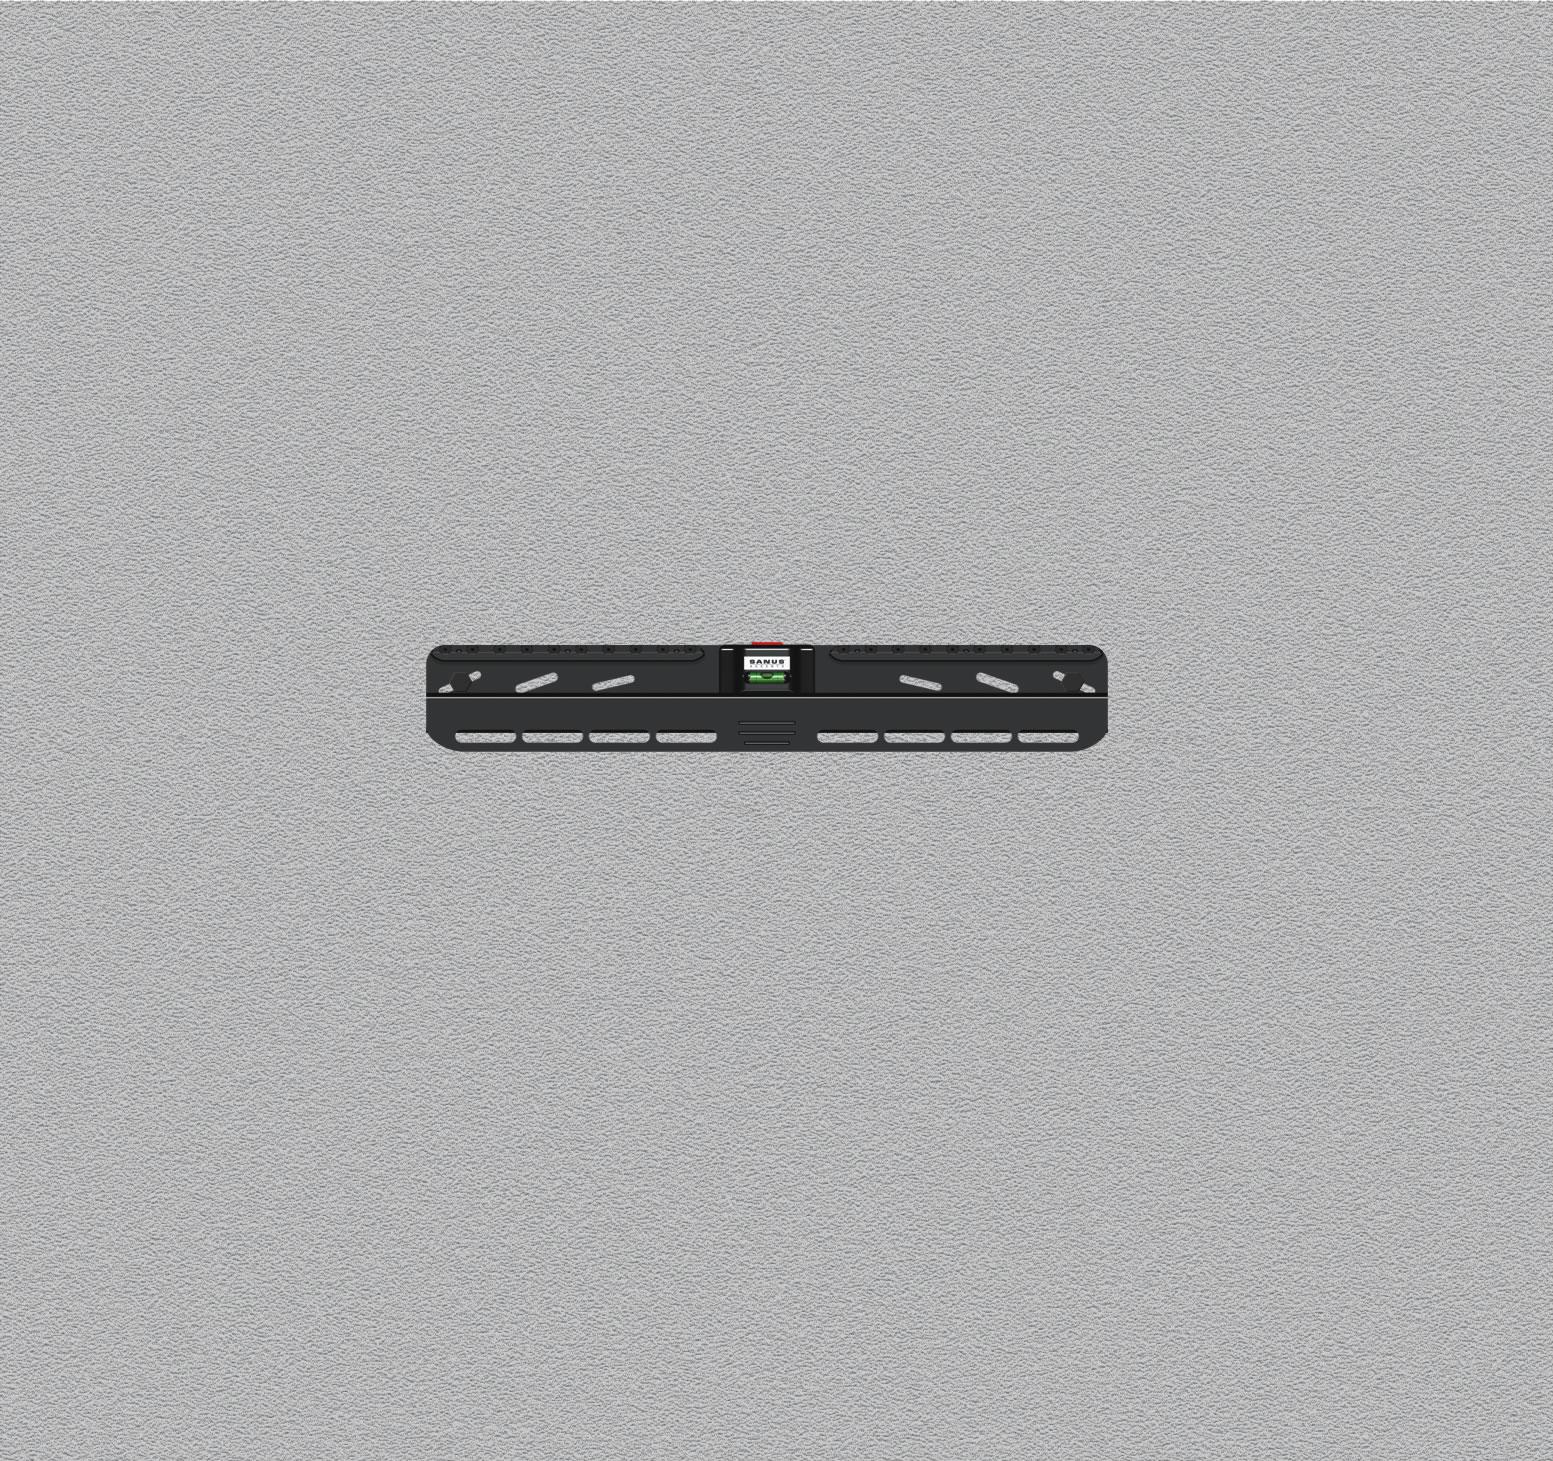 Sanus Accents Aml2a Fixed Position Wall Mounts Mounts